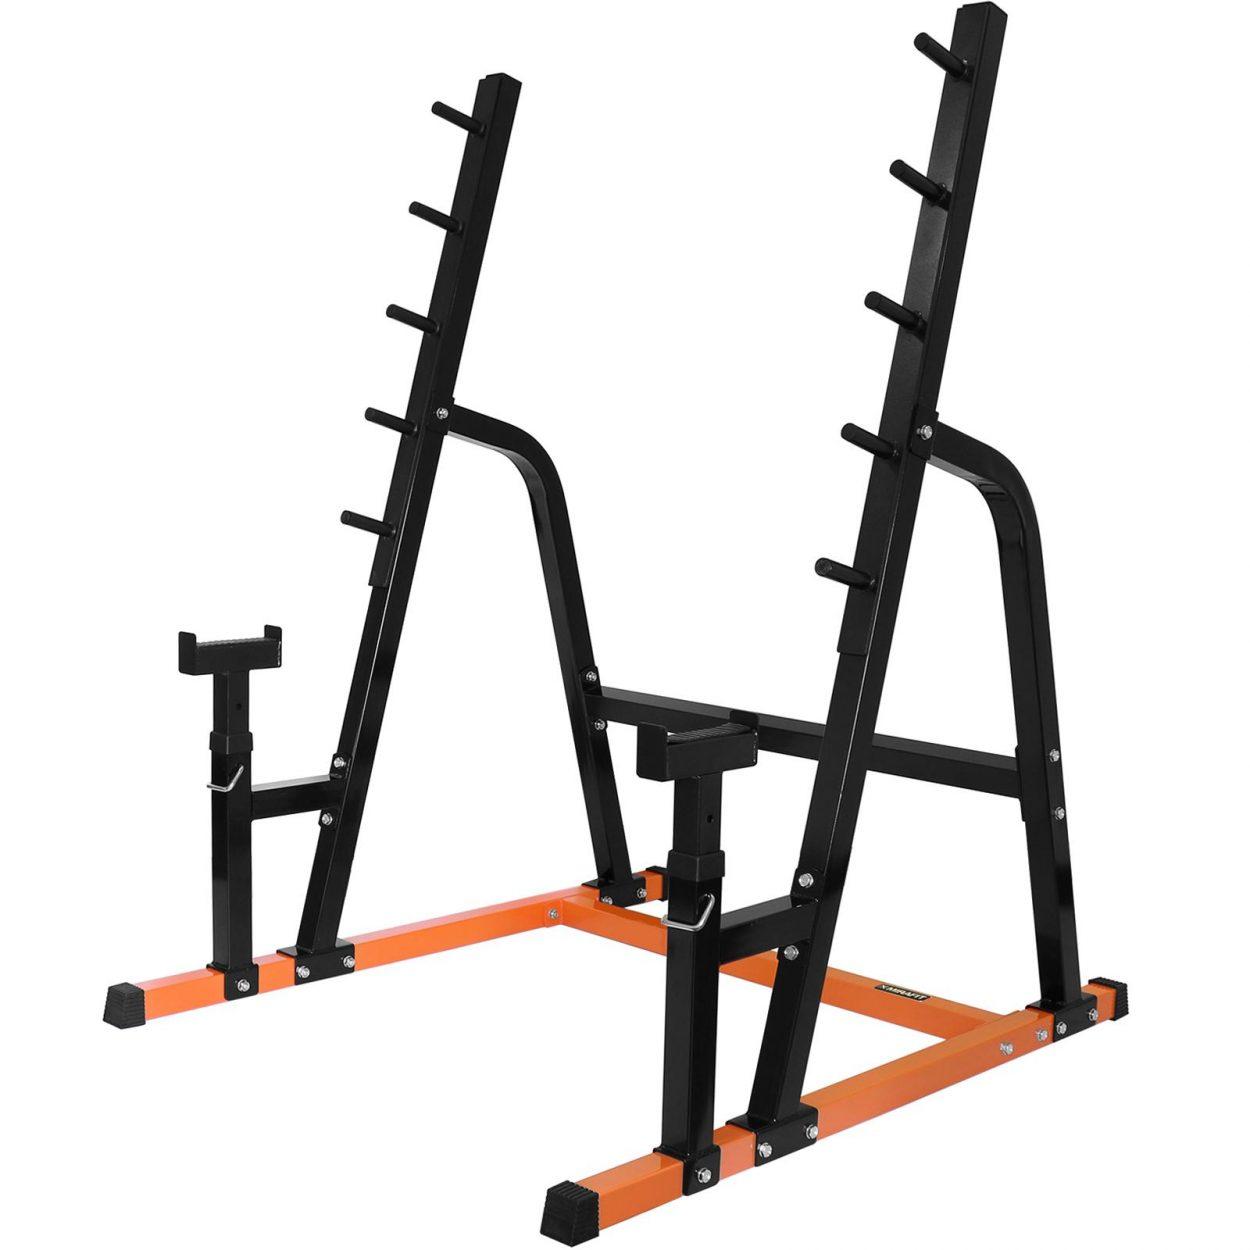 Mirafit M1 Multi Use Weight Lifting Rack